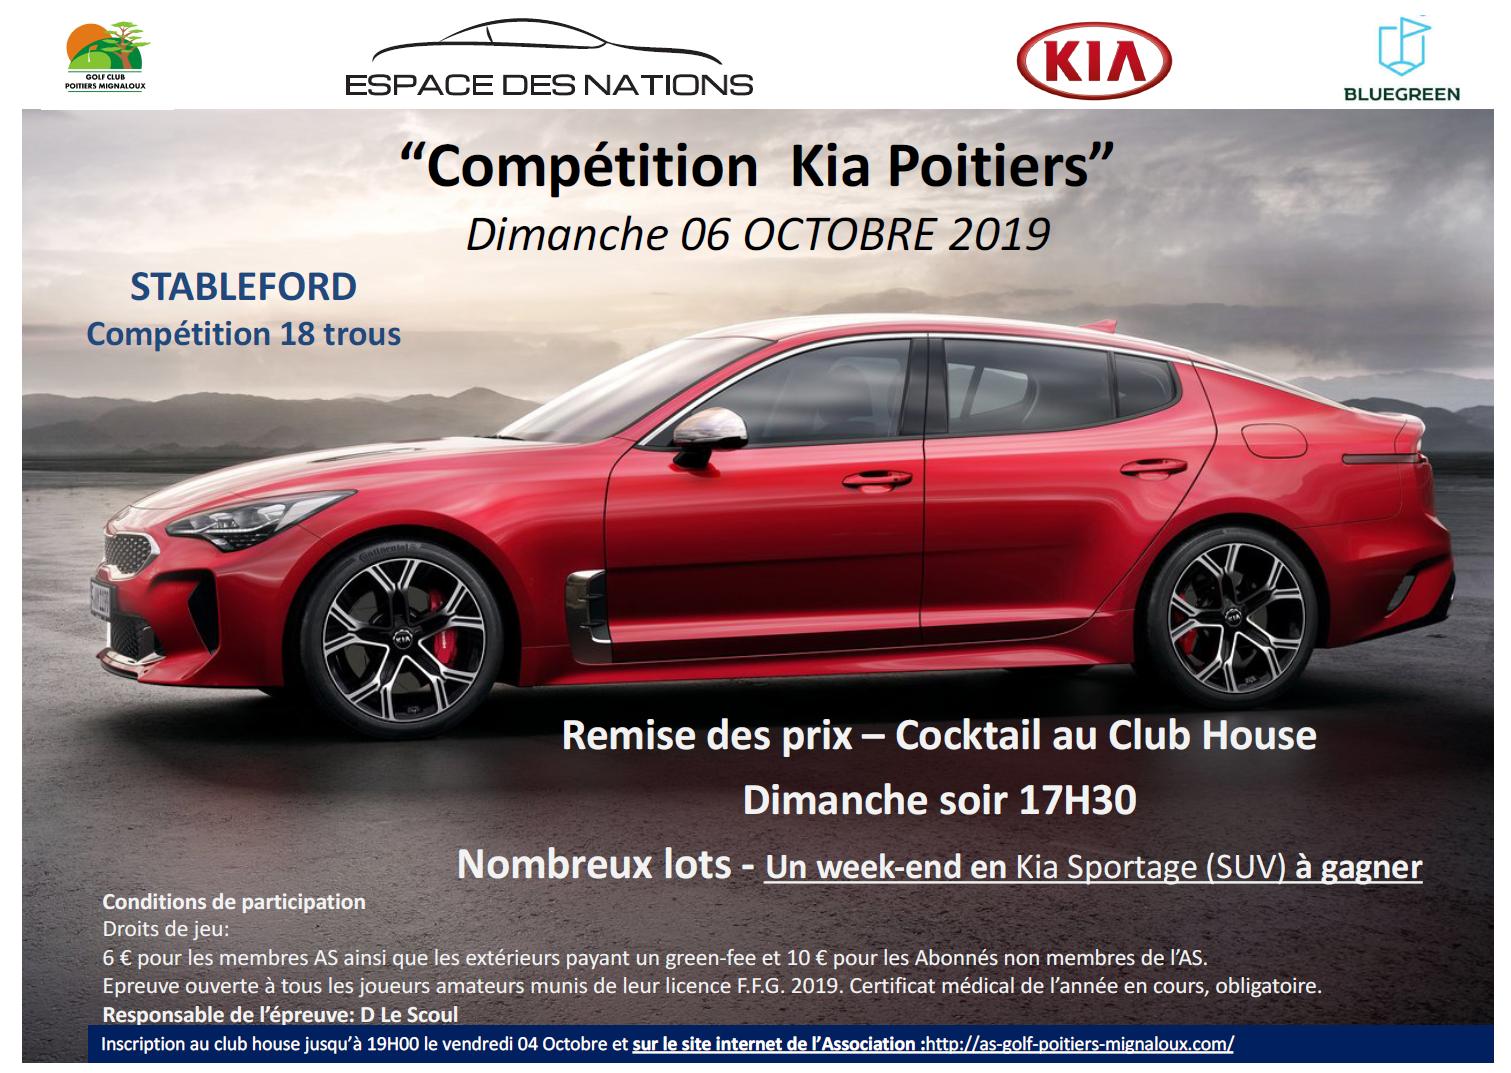 Compétition KIA Poitiers